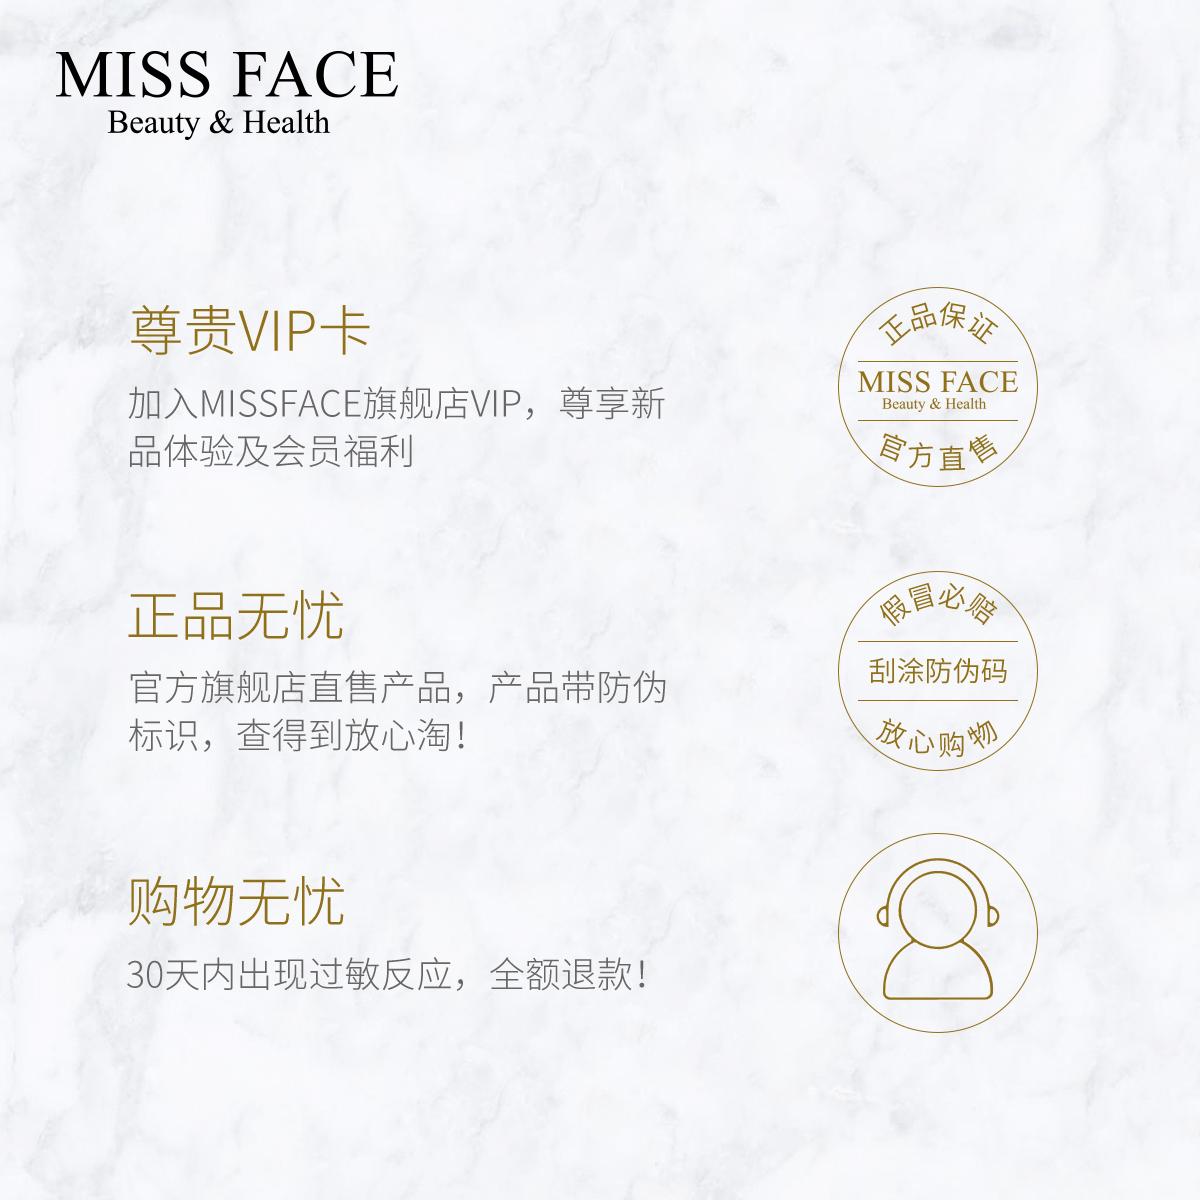 Missface烟酰胺化妆品套装女水乳液霜保湿补水学生护肤品套装正品